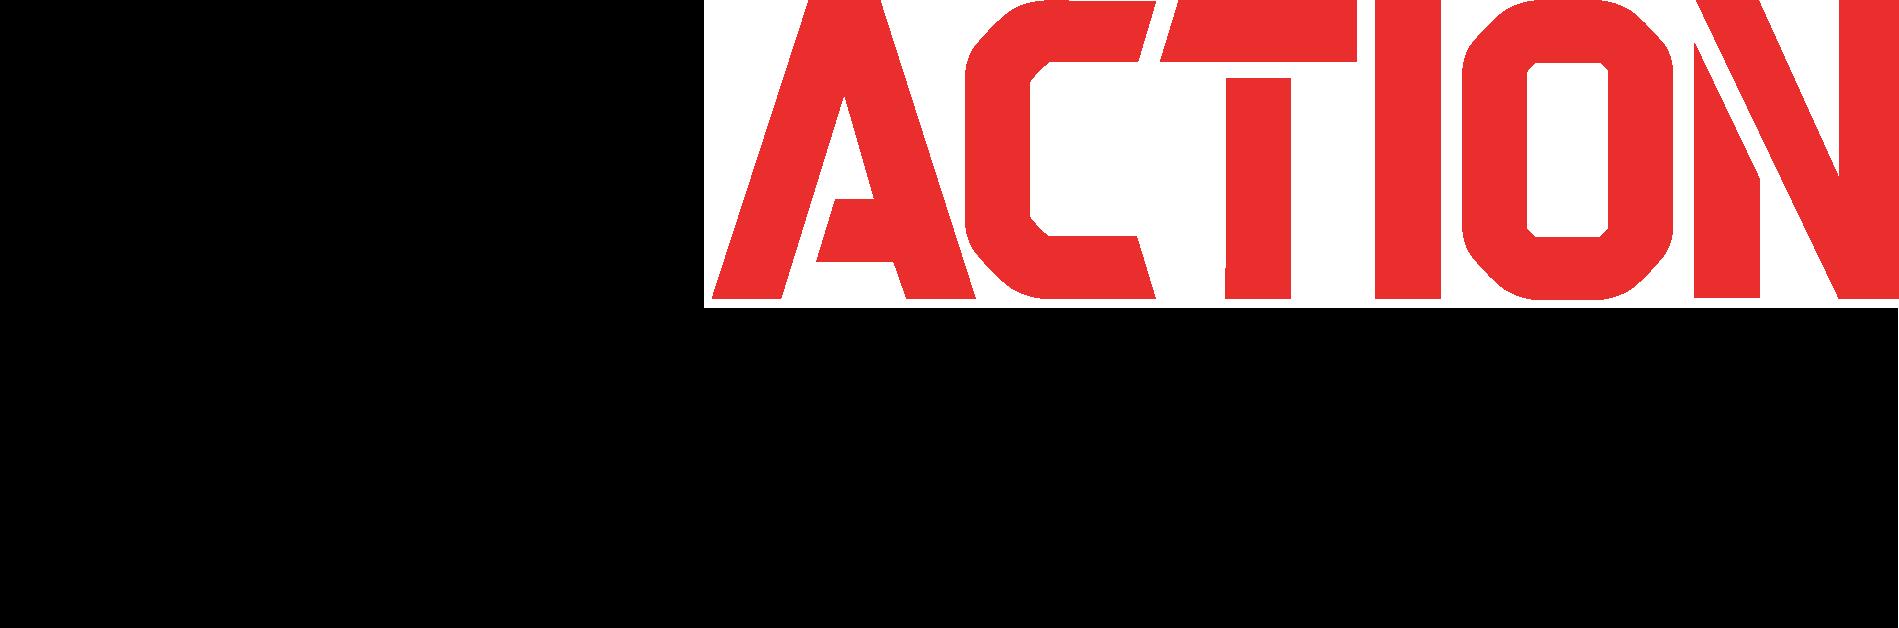 FOXActionMovies logo 2